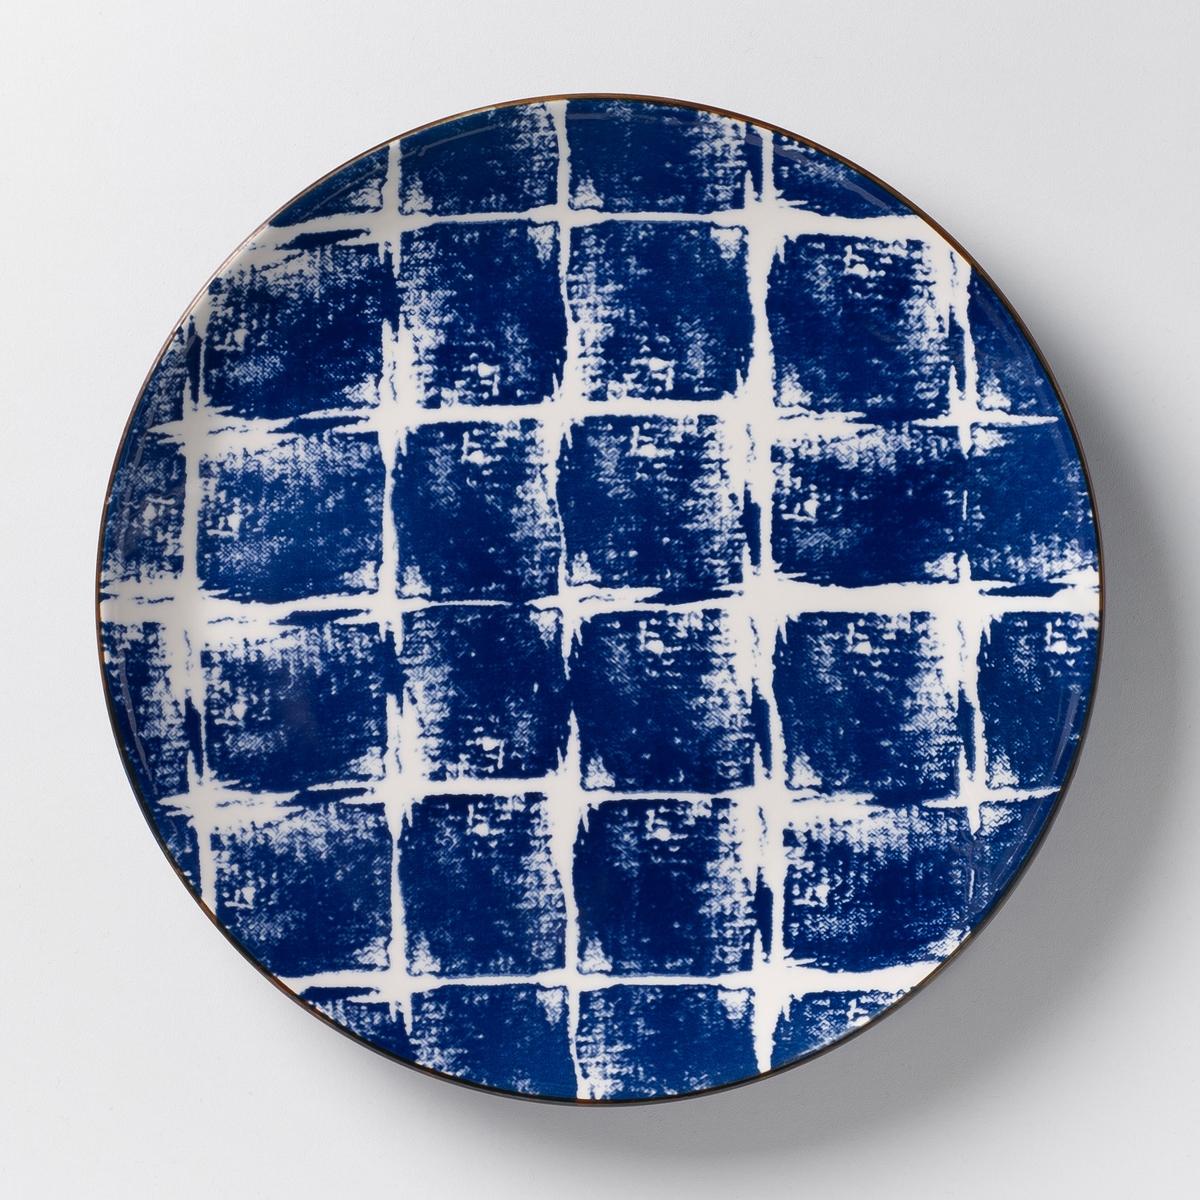 Комплект из 4 мелких тарелок из керамики Malado